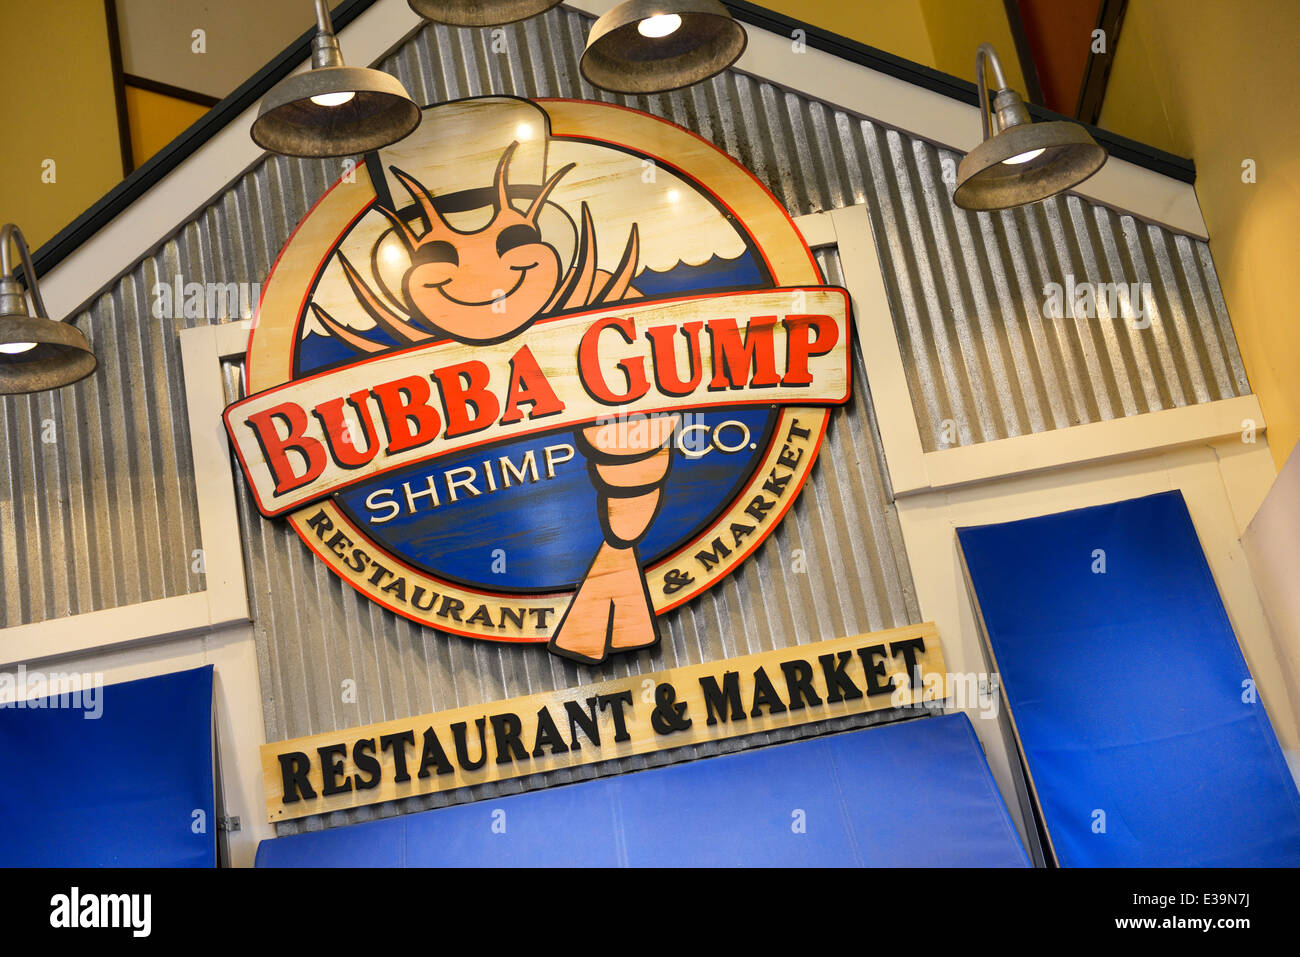 Bubba Gump Restaurant Sign At Navy Pier Chicago Stock